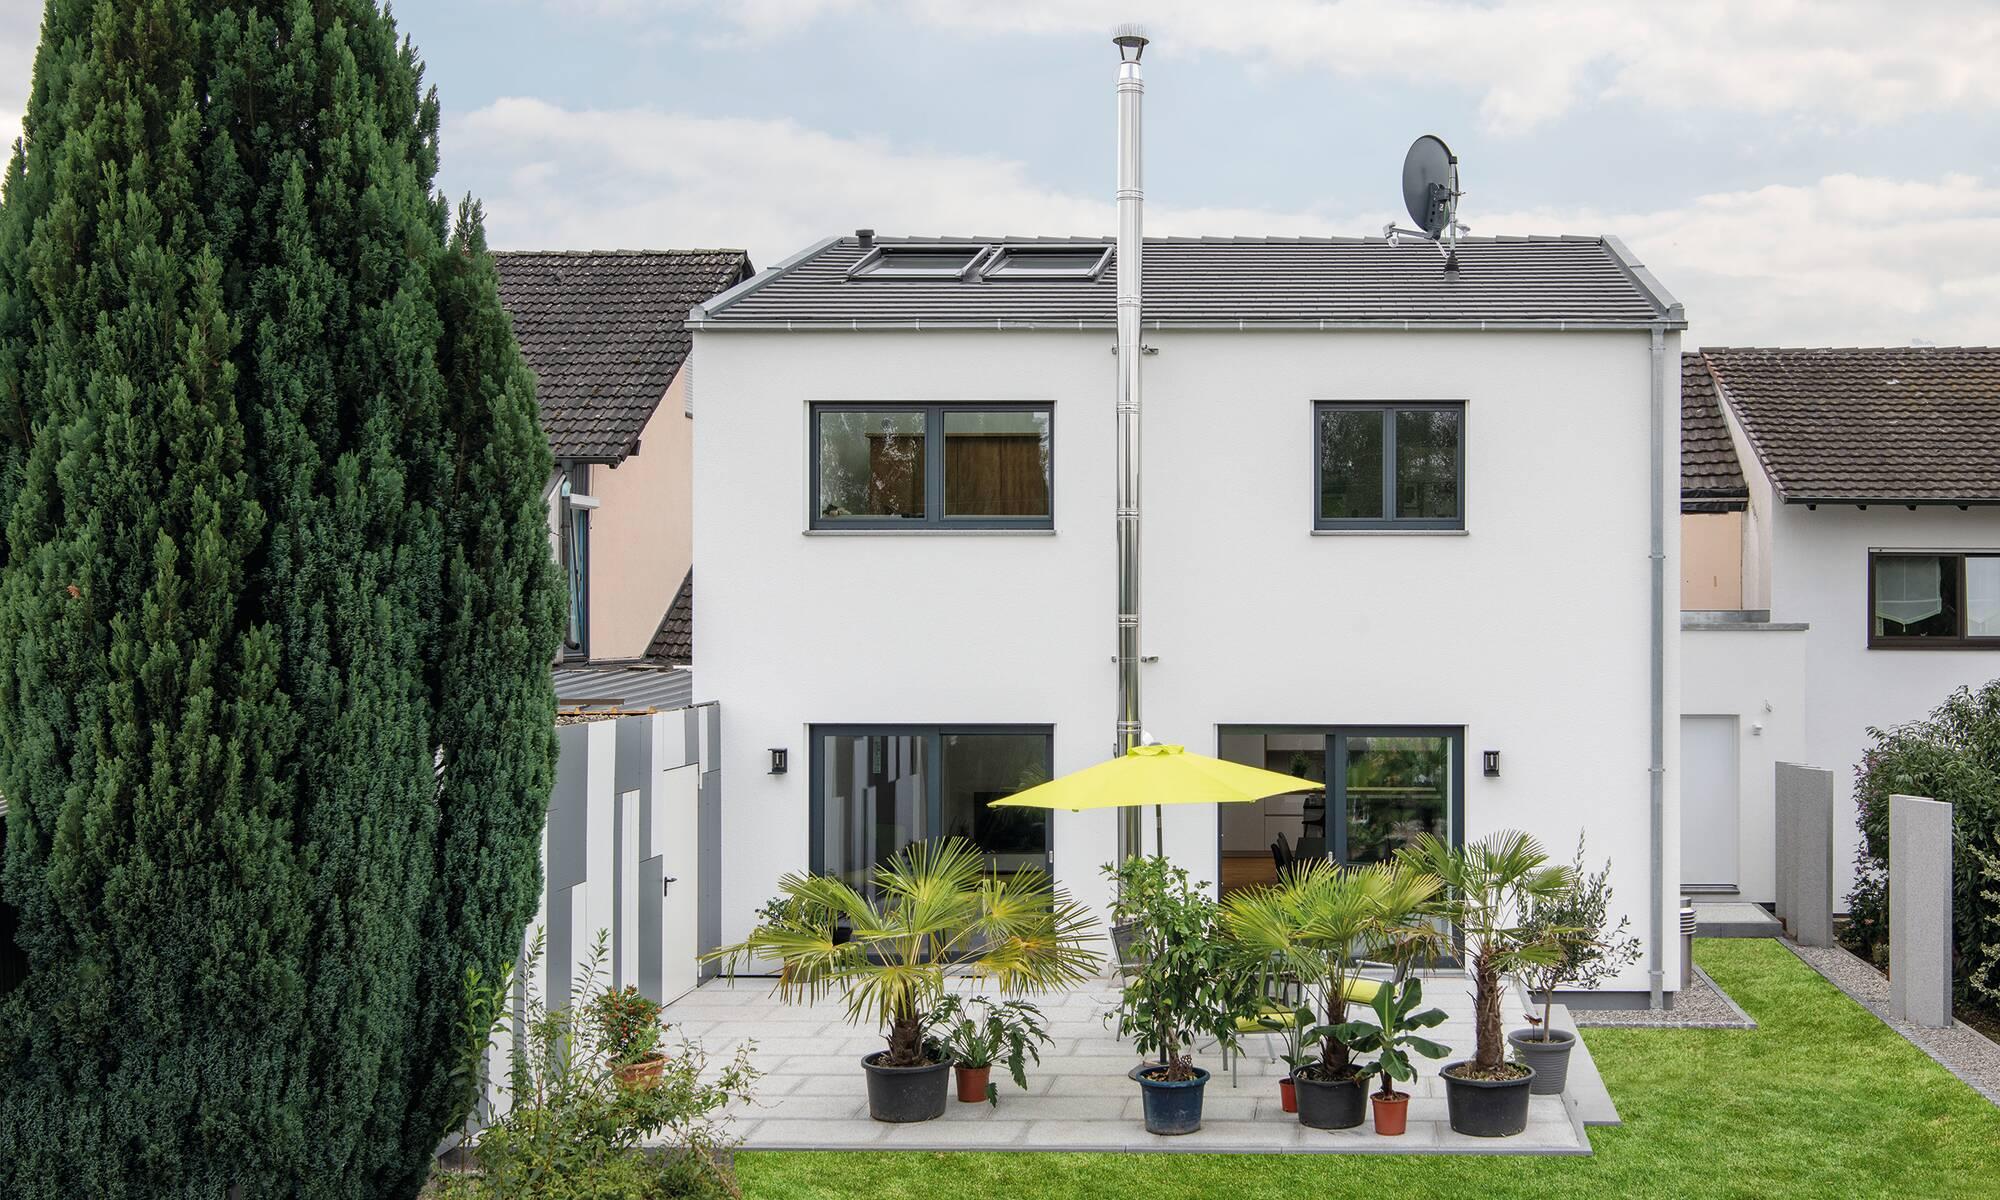 frei geplantes WeberHaus Kundenhaus